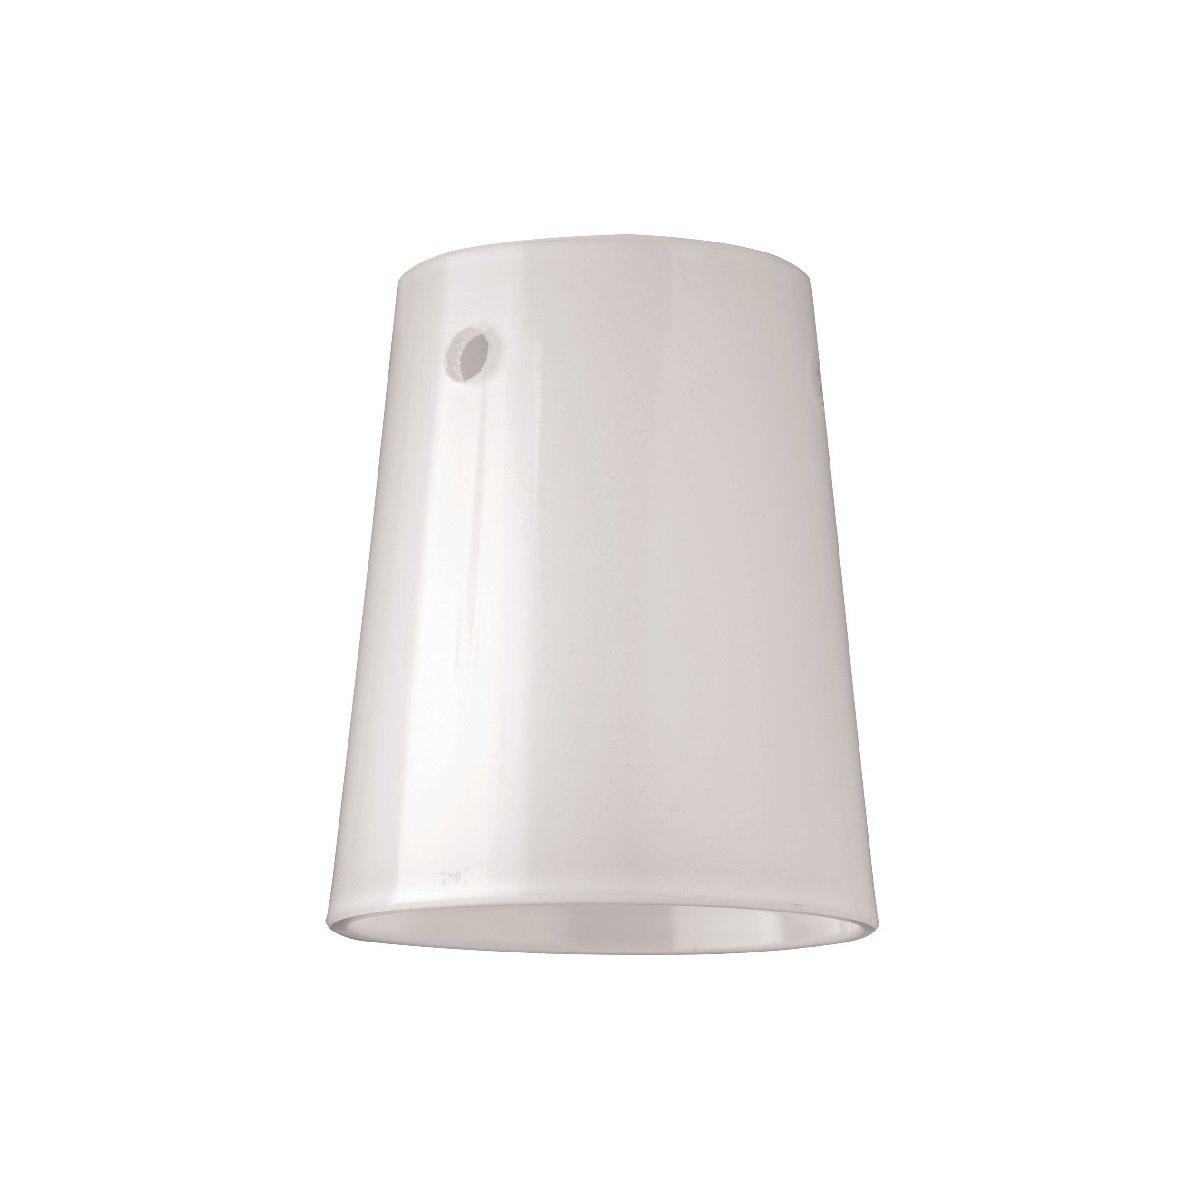 fischer m6 glas lampenschirm no 24350 opal gl nzend eur 9 90 leuchten lampen led. Black Bedroom Furniture Sets. Home Design Ideas